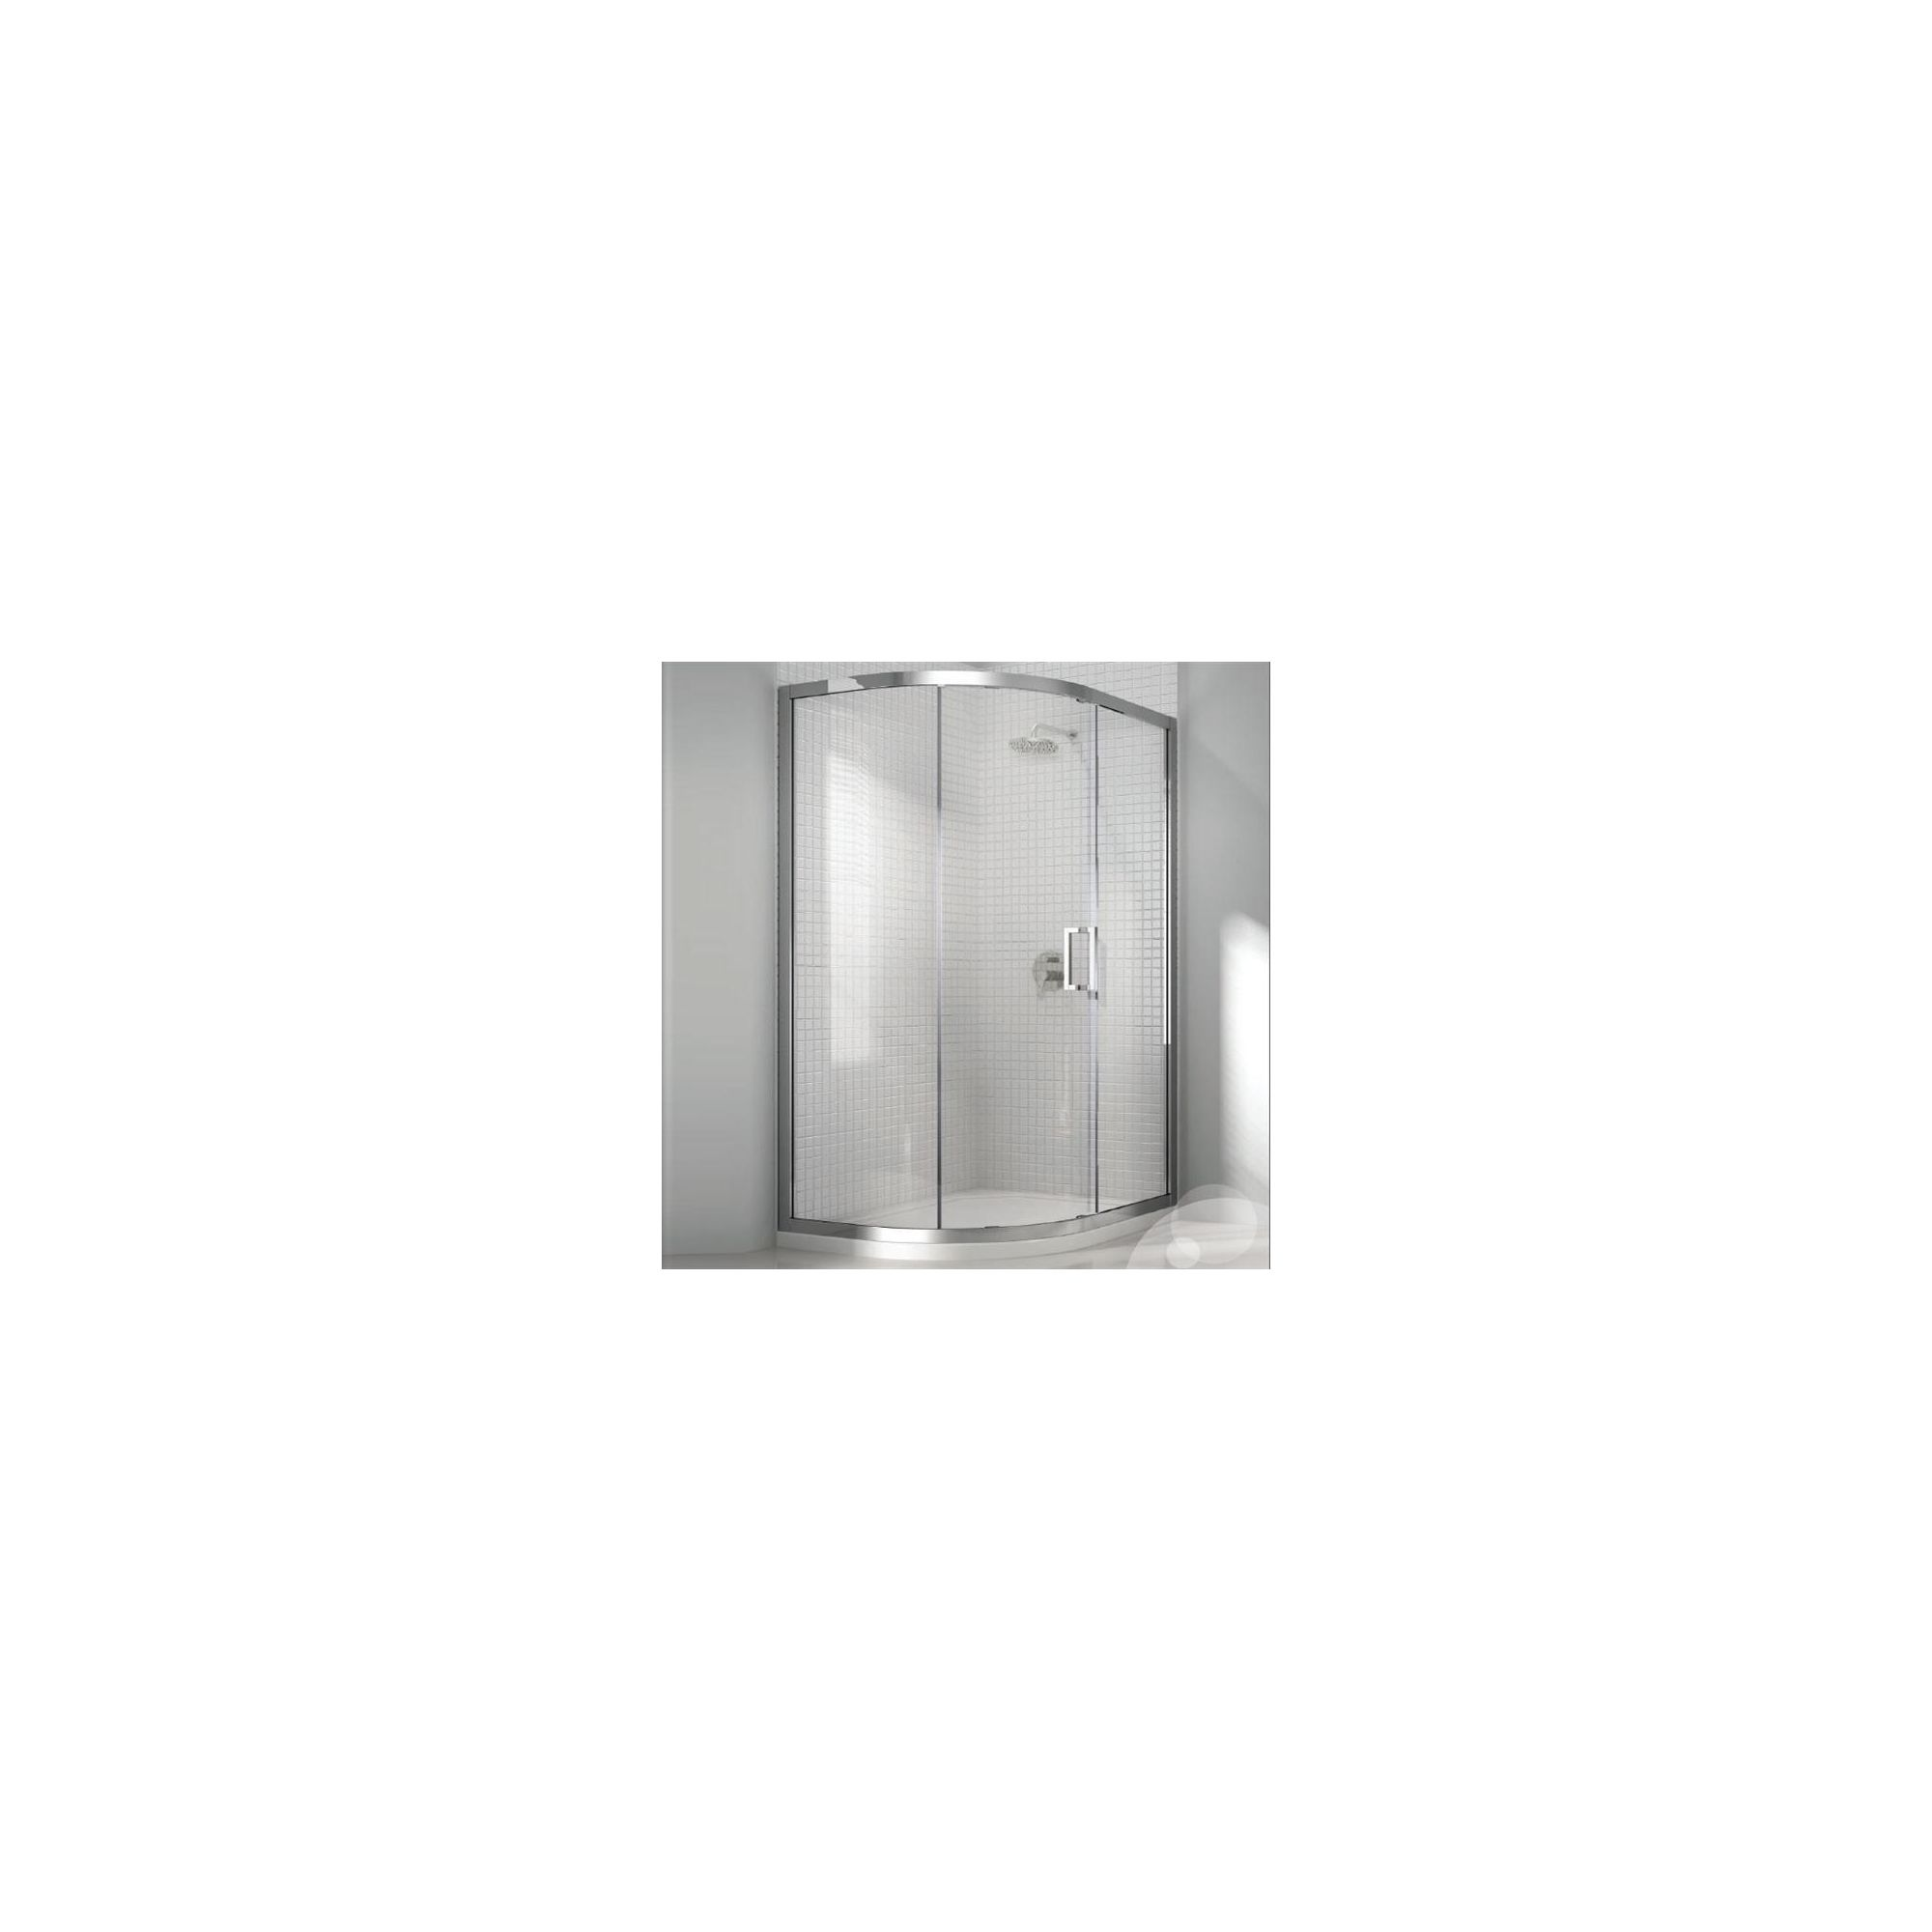 Merlyn Vivid Eight Offset Quadrant Shower Door, 1000mm x 800mm, 8mm Glass at Tesco Direct